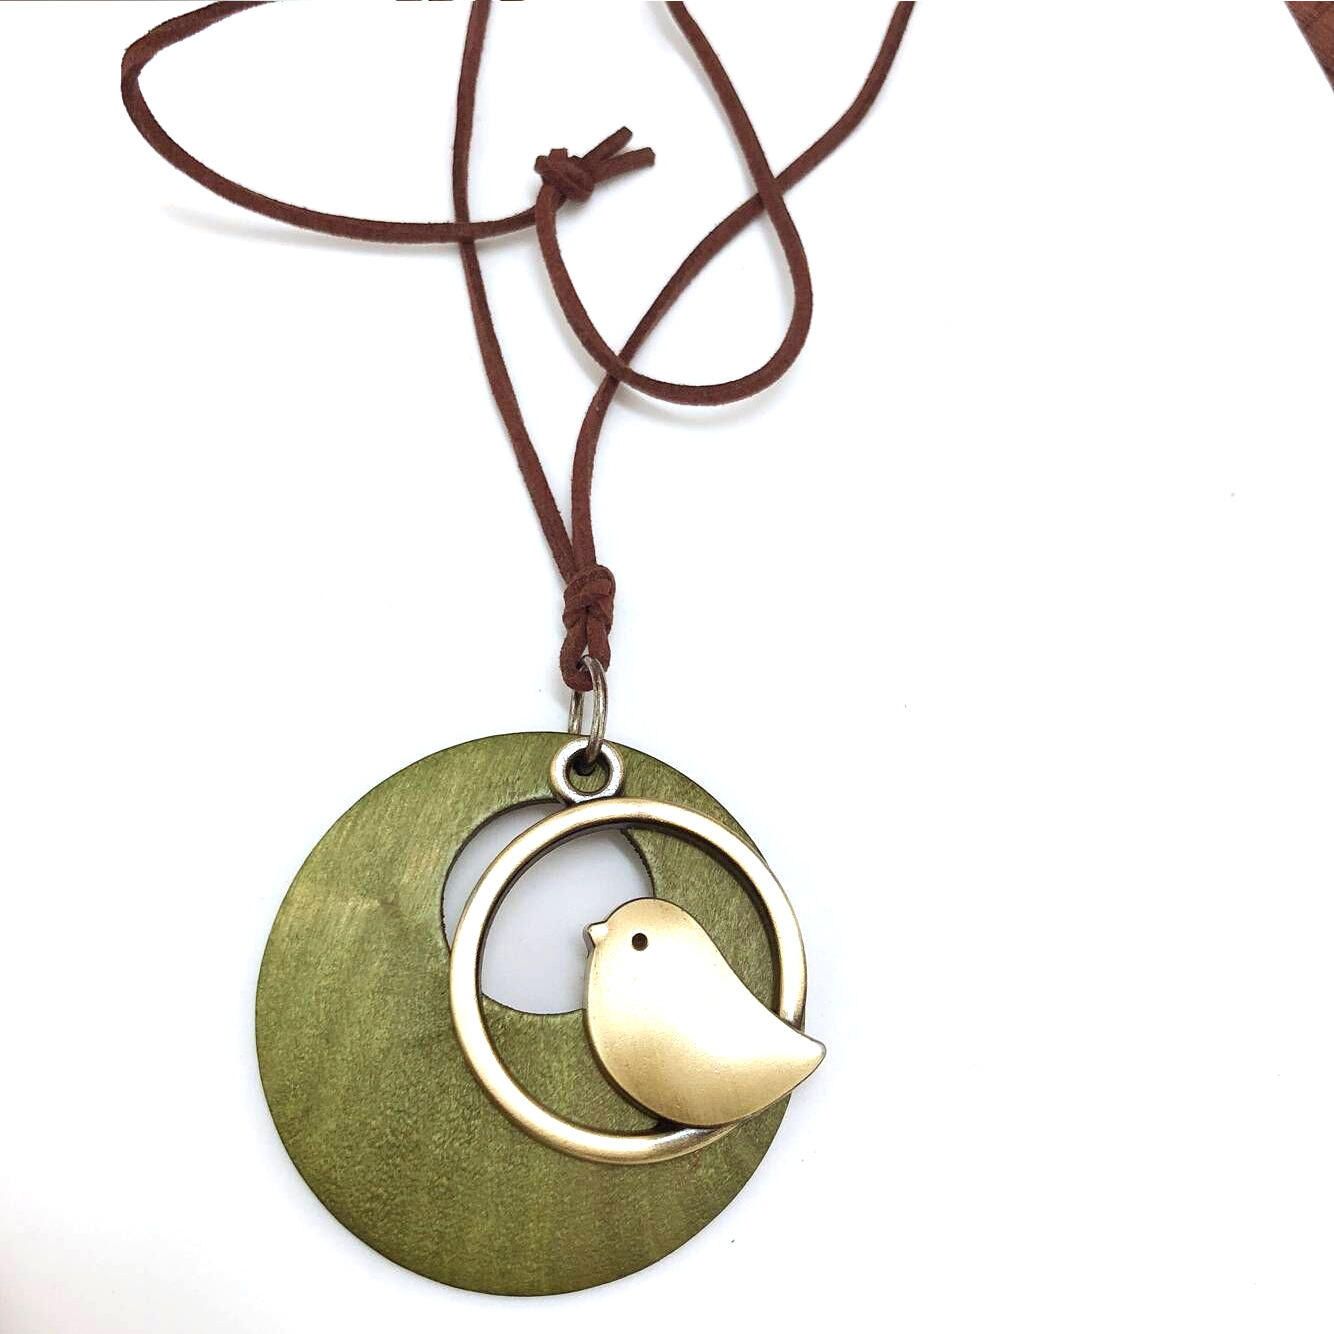 Fashion Women Handmade Bird Pendant Long Necklace Leather Chain Choker Jewelry